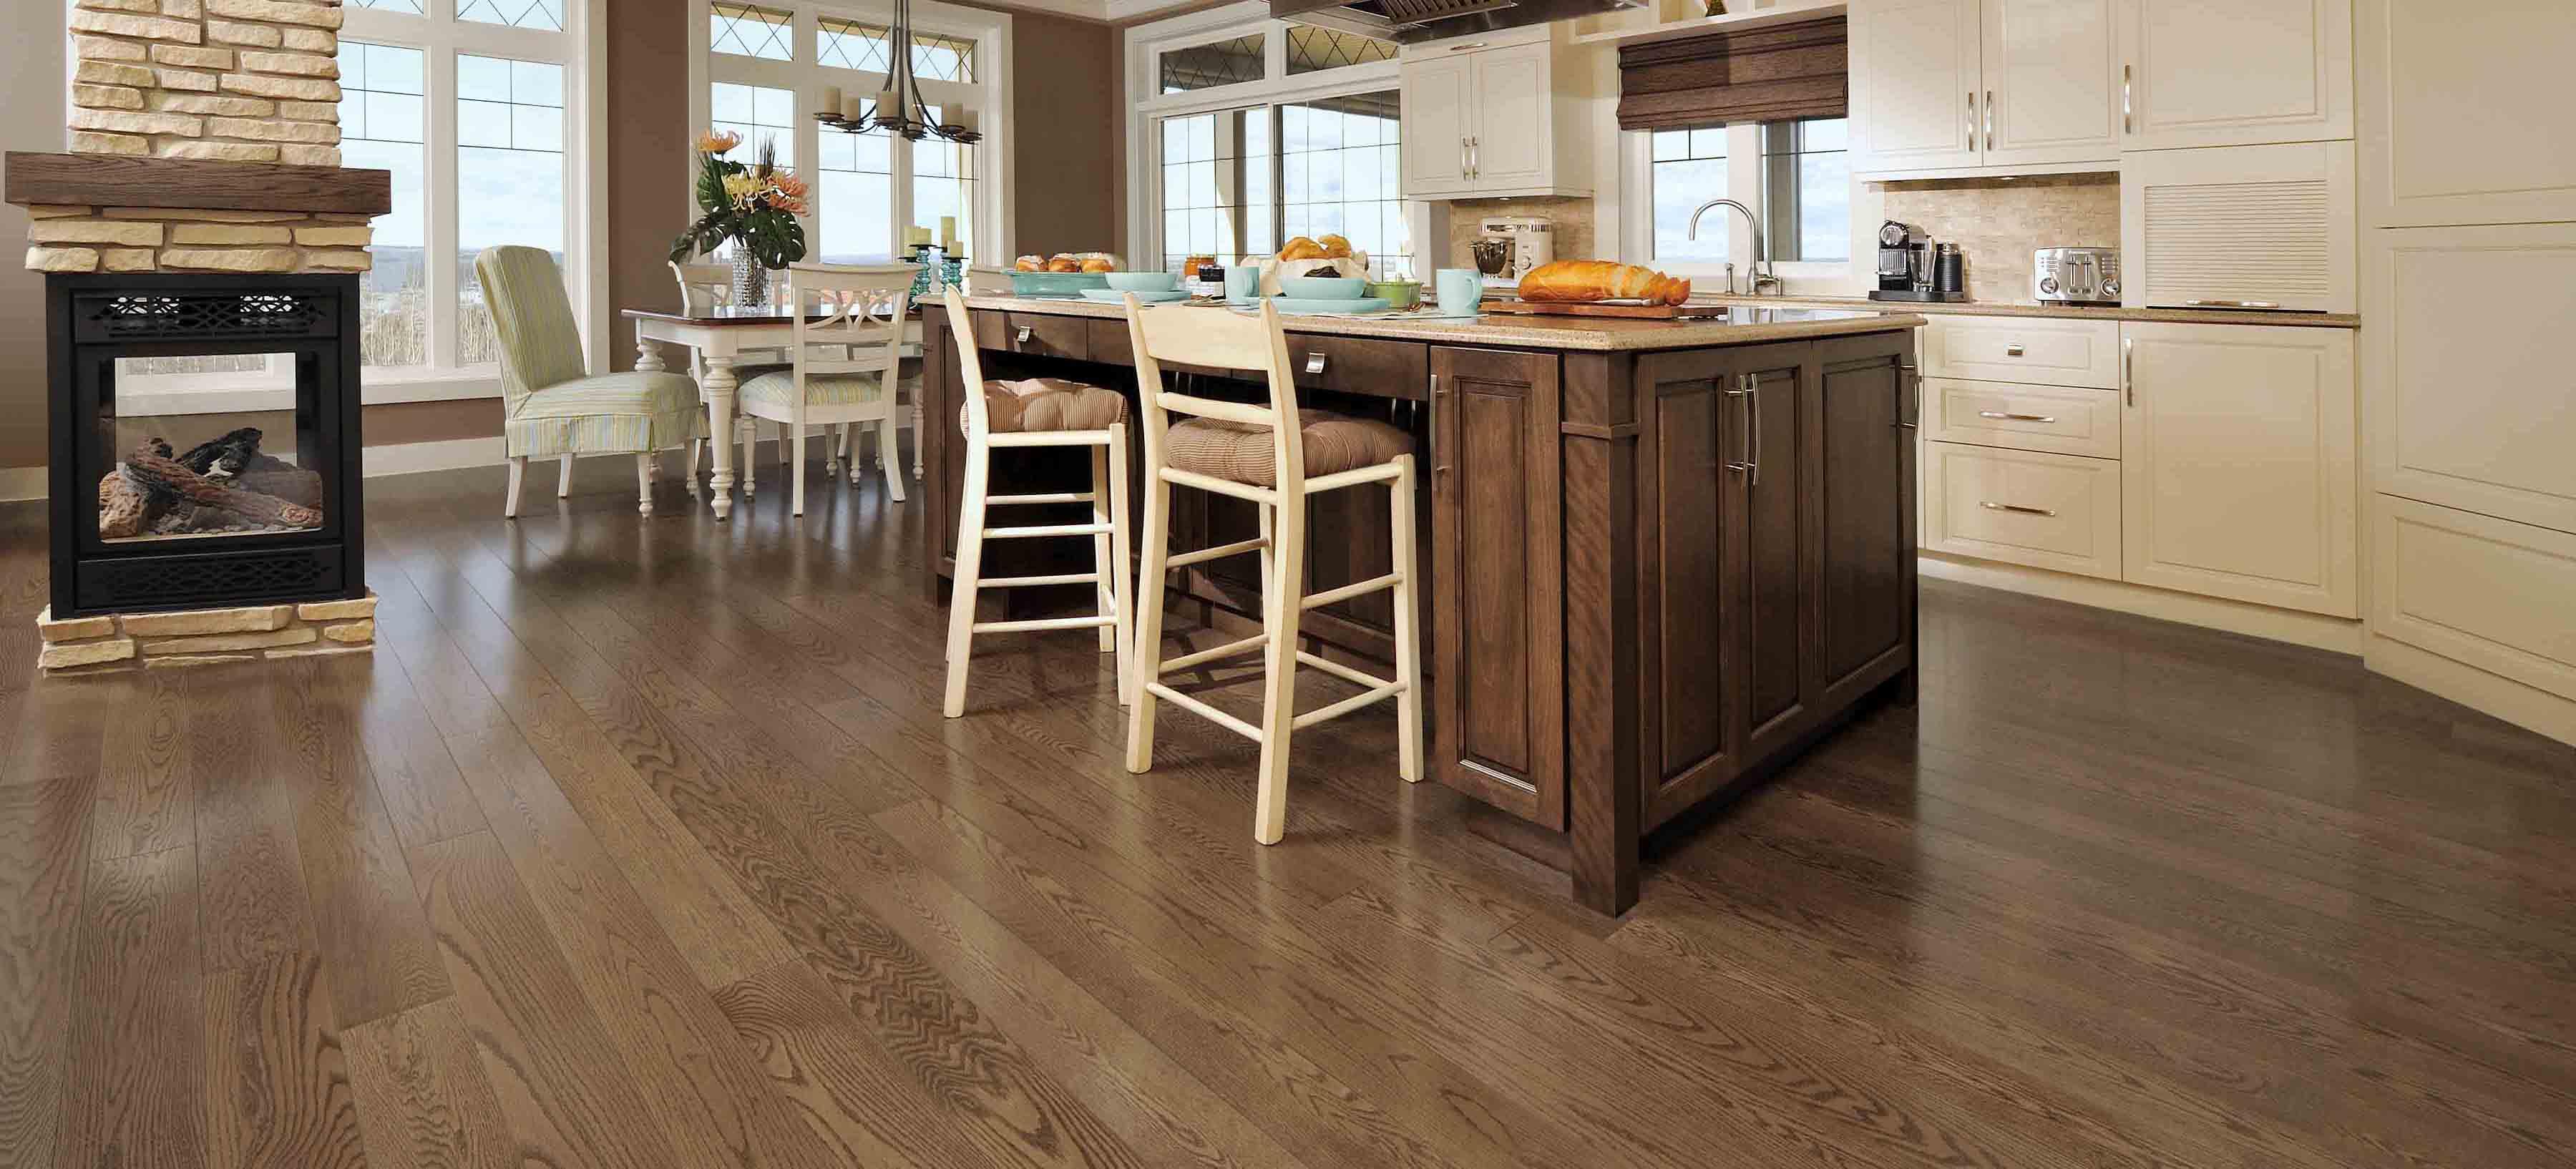 Supreme floors indoor flooring outdoor decking sri for Exterior linoleum flooring